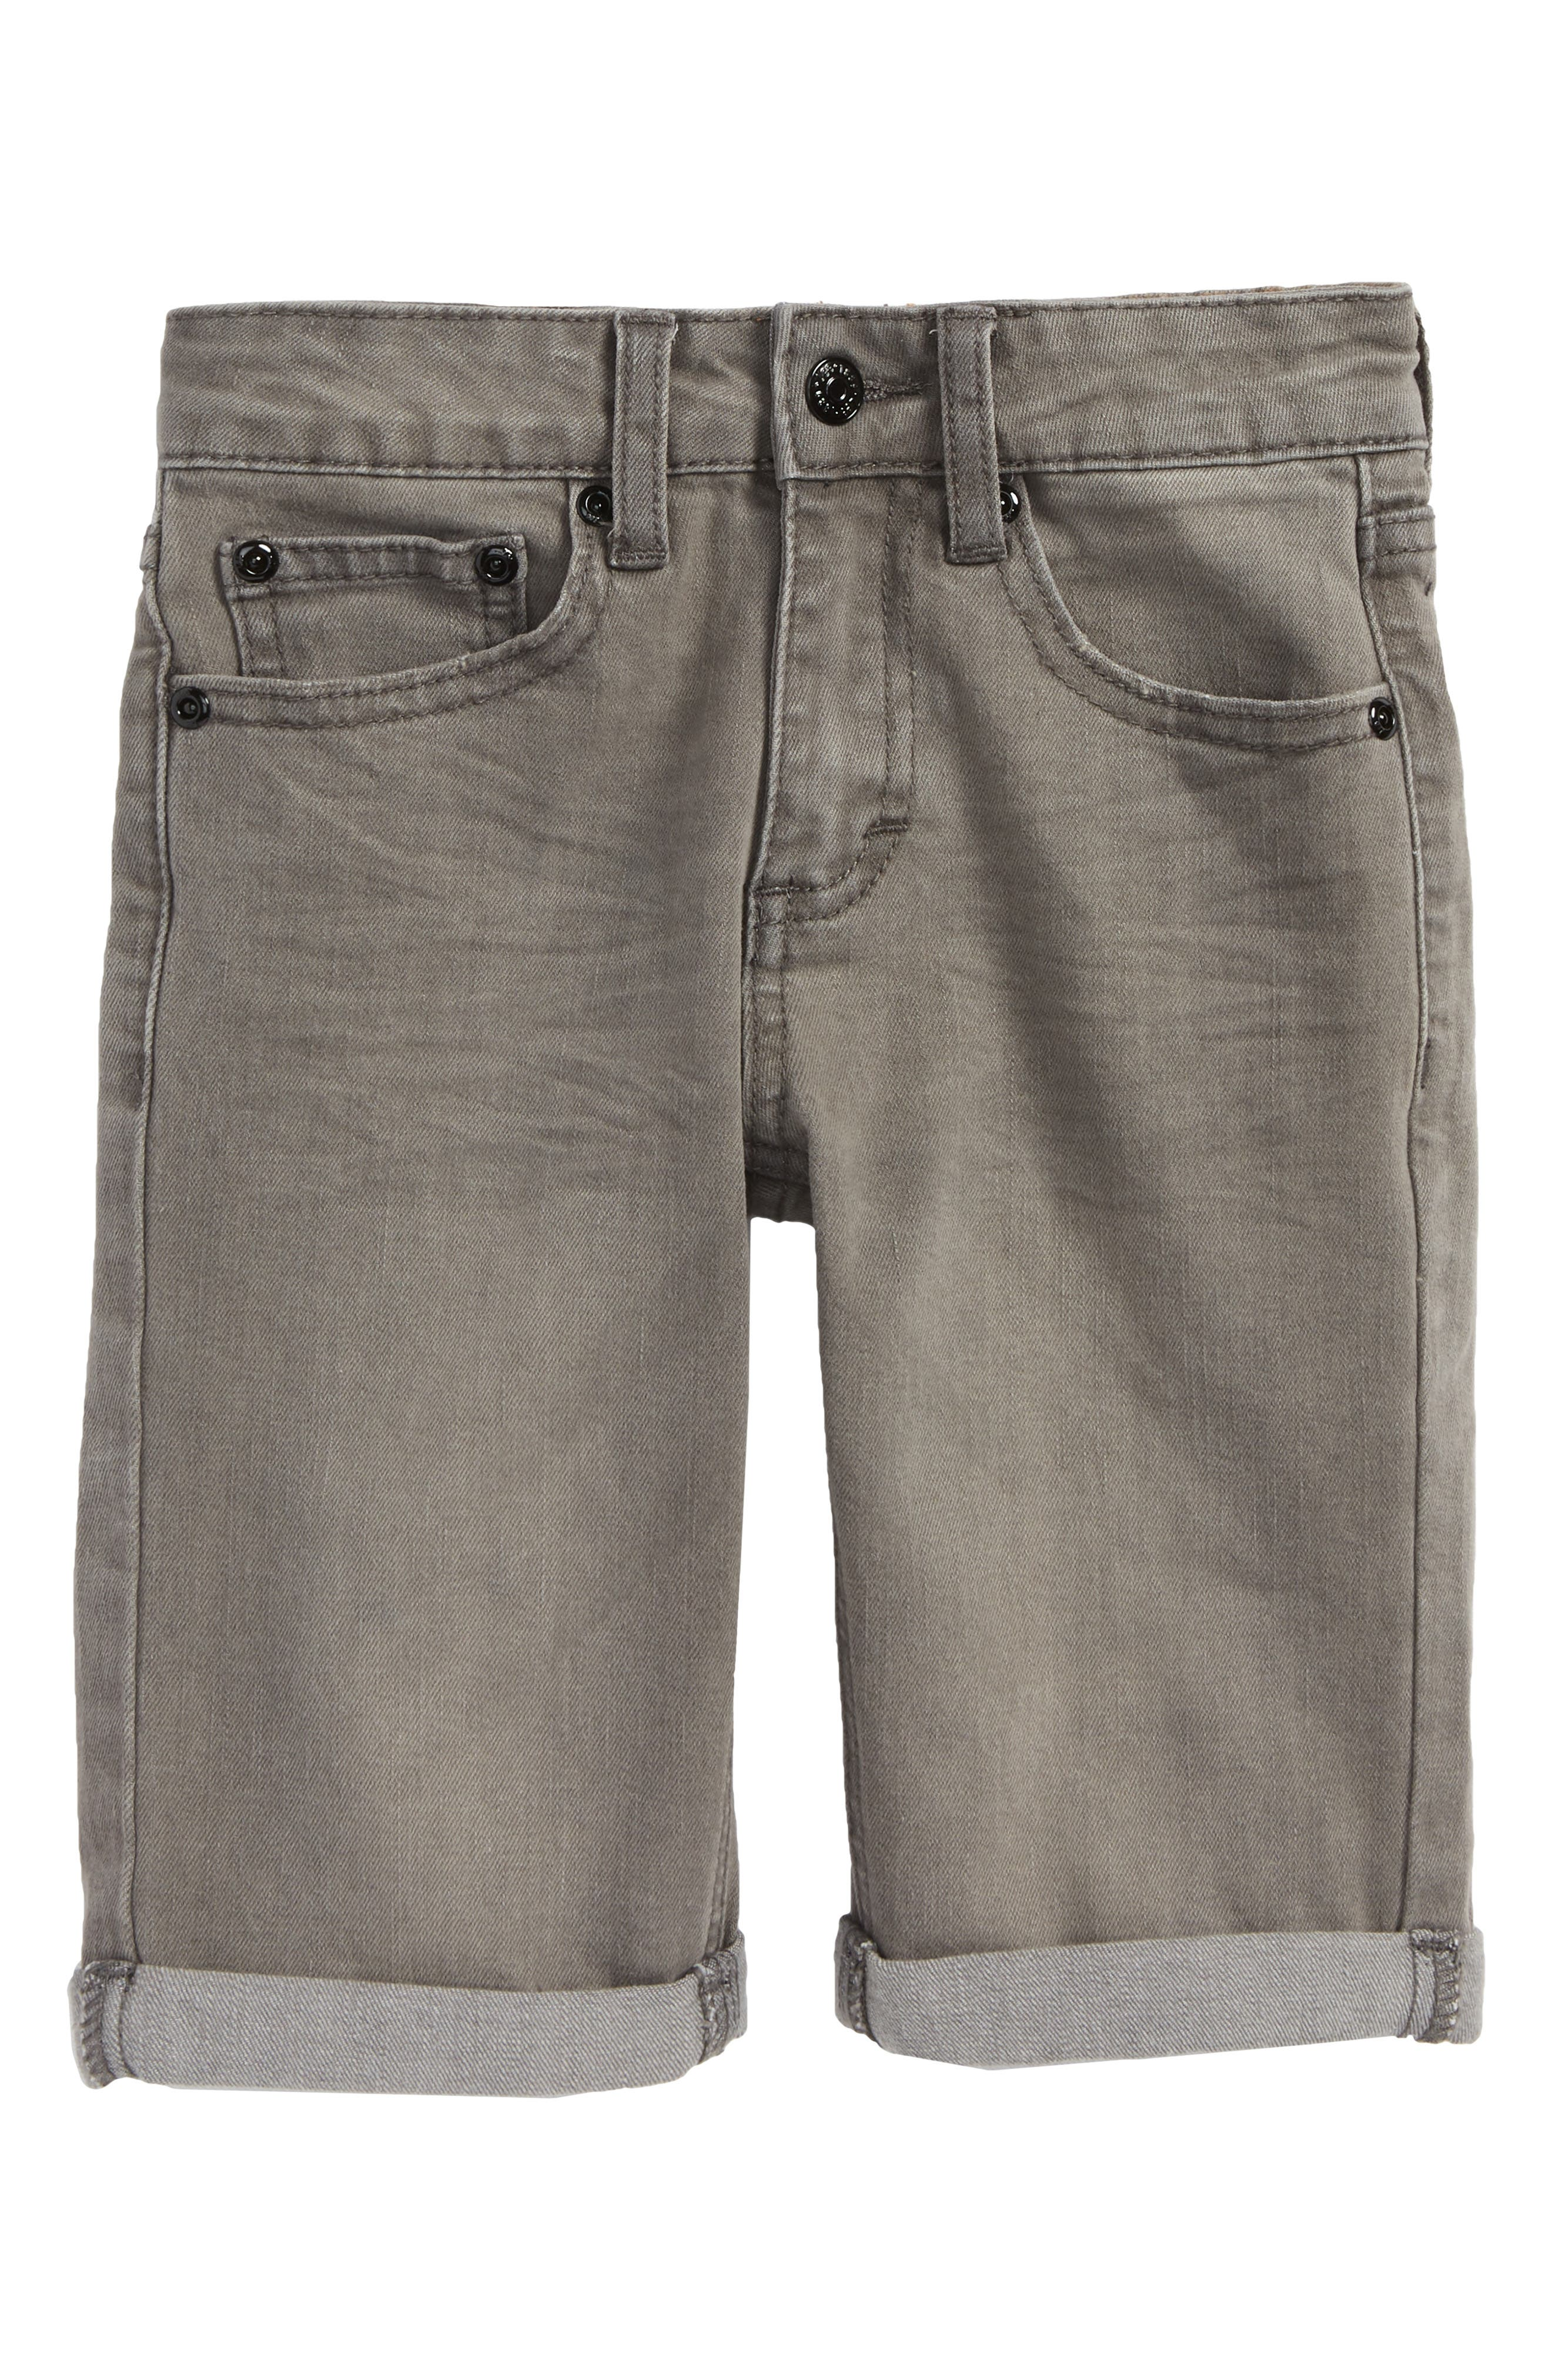 Stretch Denim Roll Cuff Shorts,                             Main thumbnail 1, color,                             060